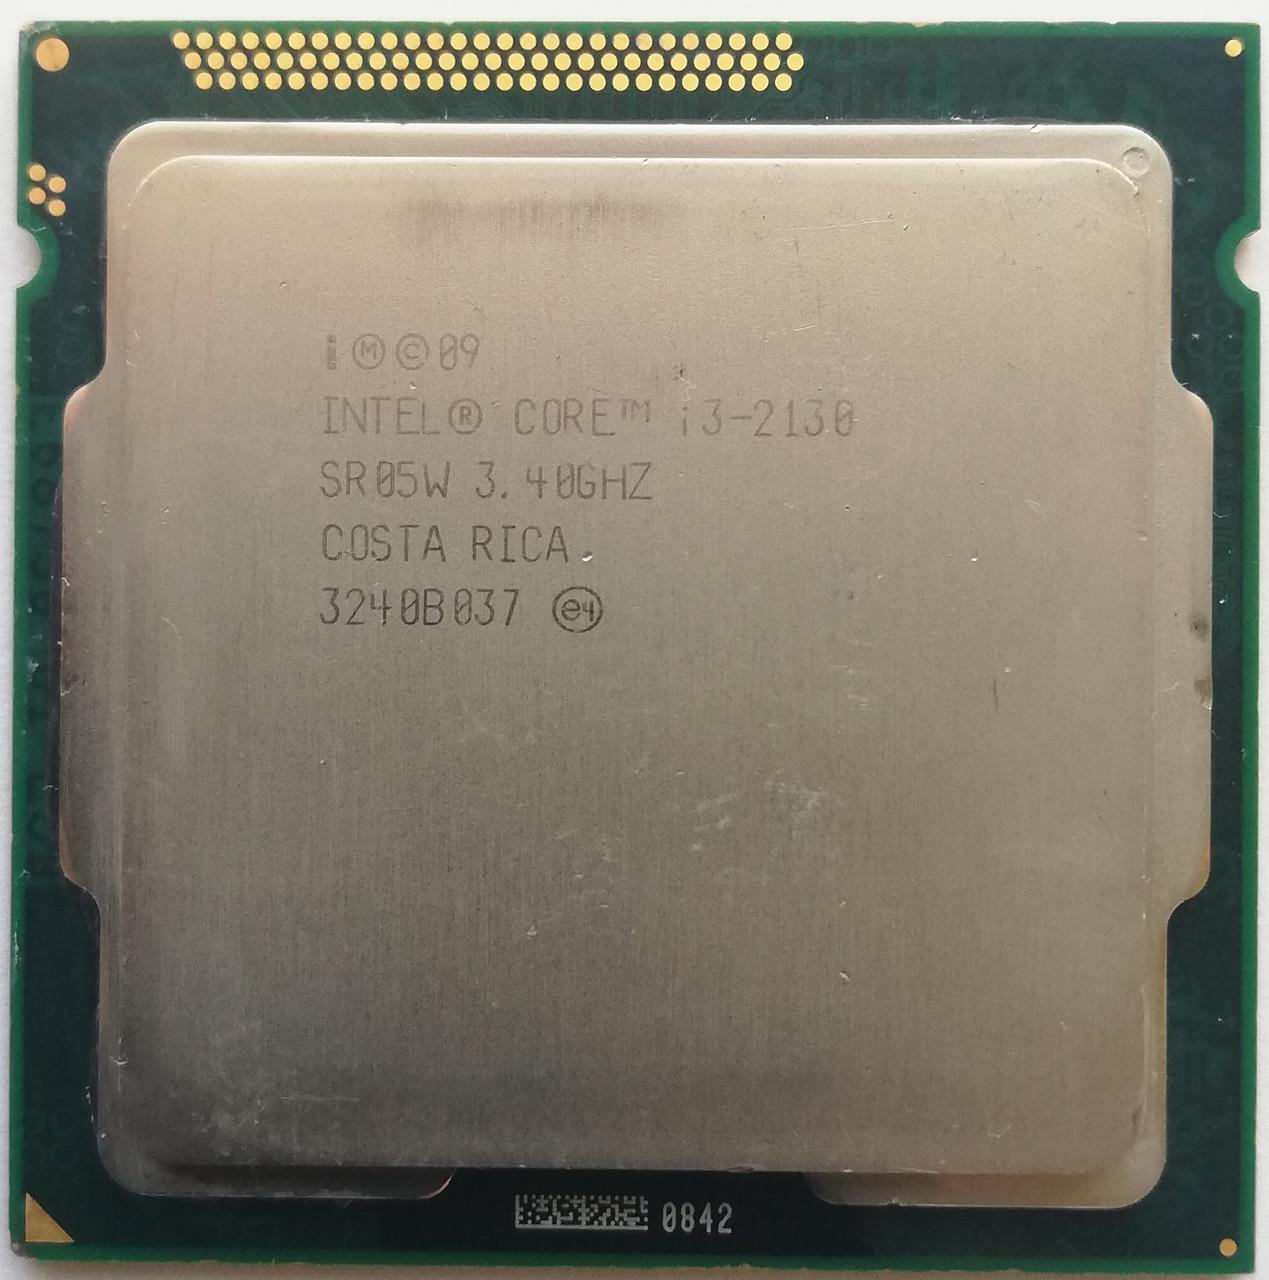 Процессор Intel Core i3-2130 SR05W 3.4GHz 3M Cache Socket 1155 Б/У